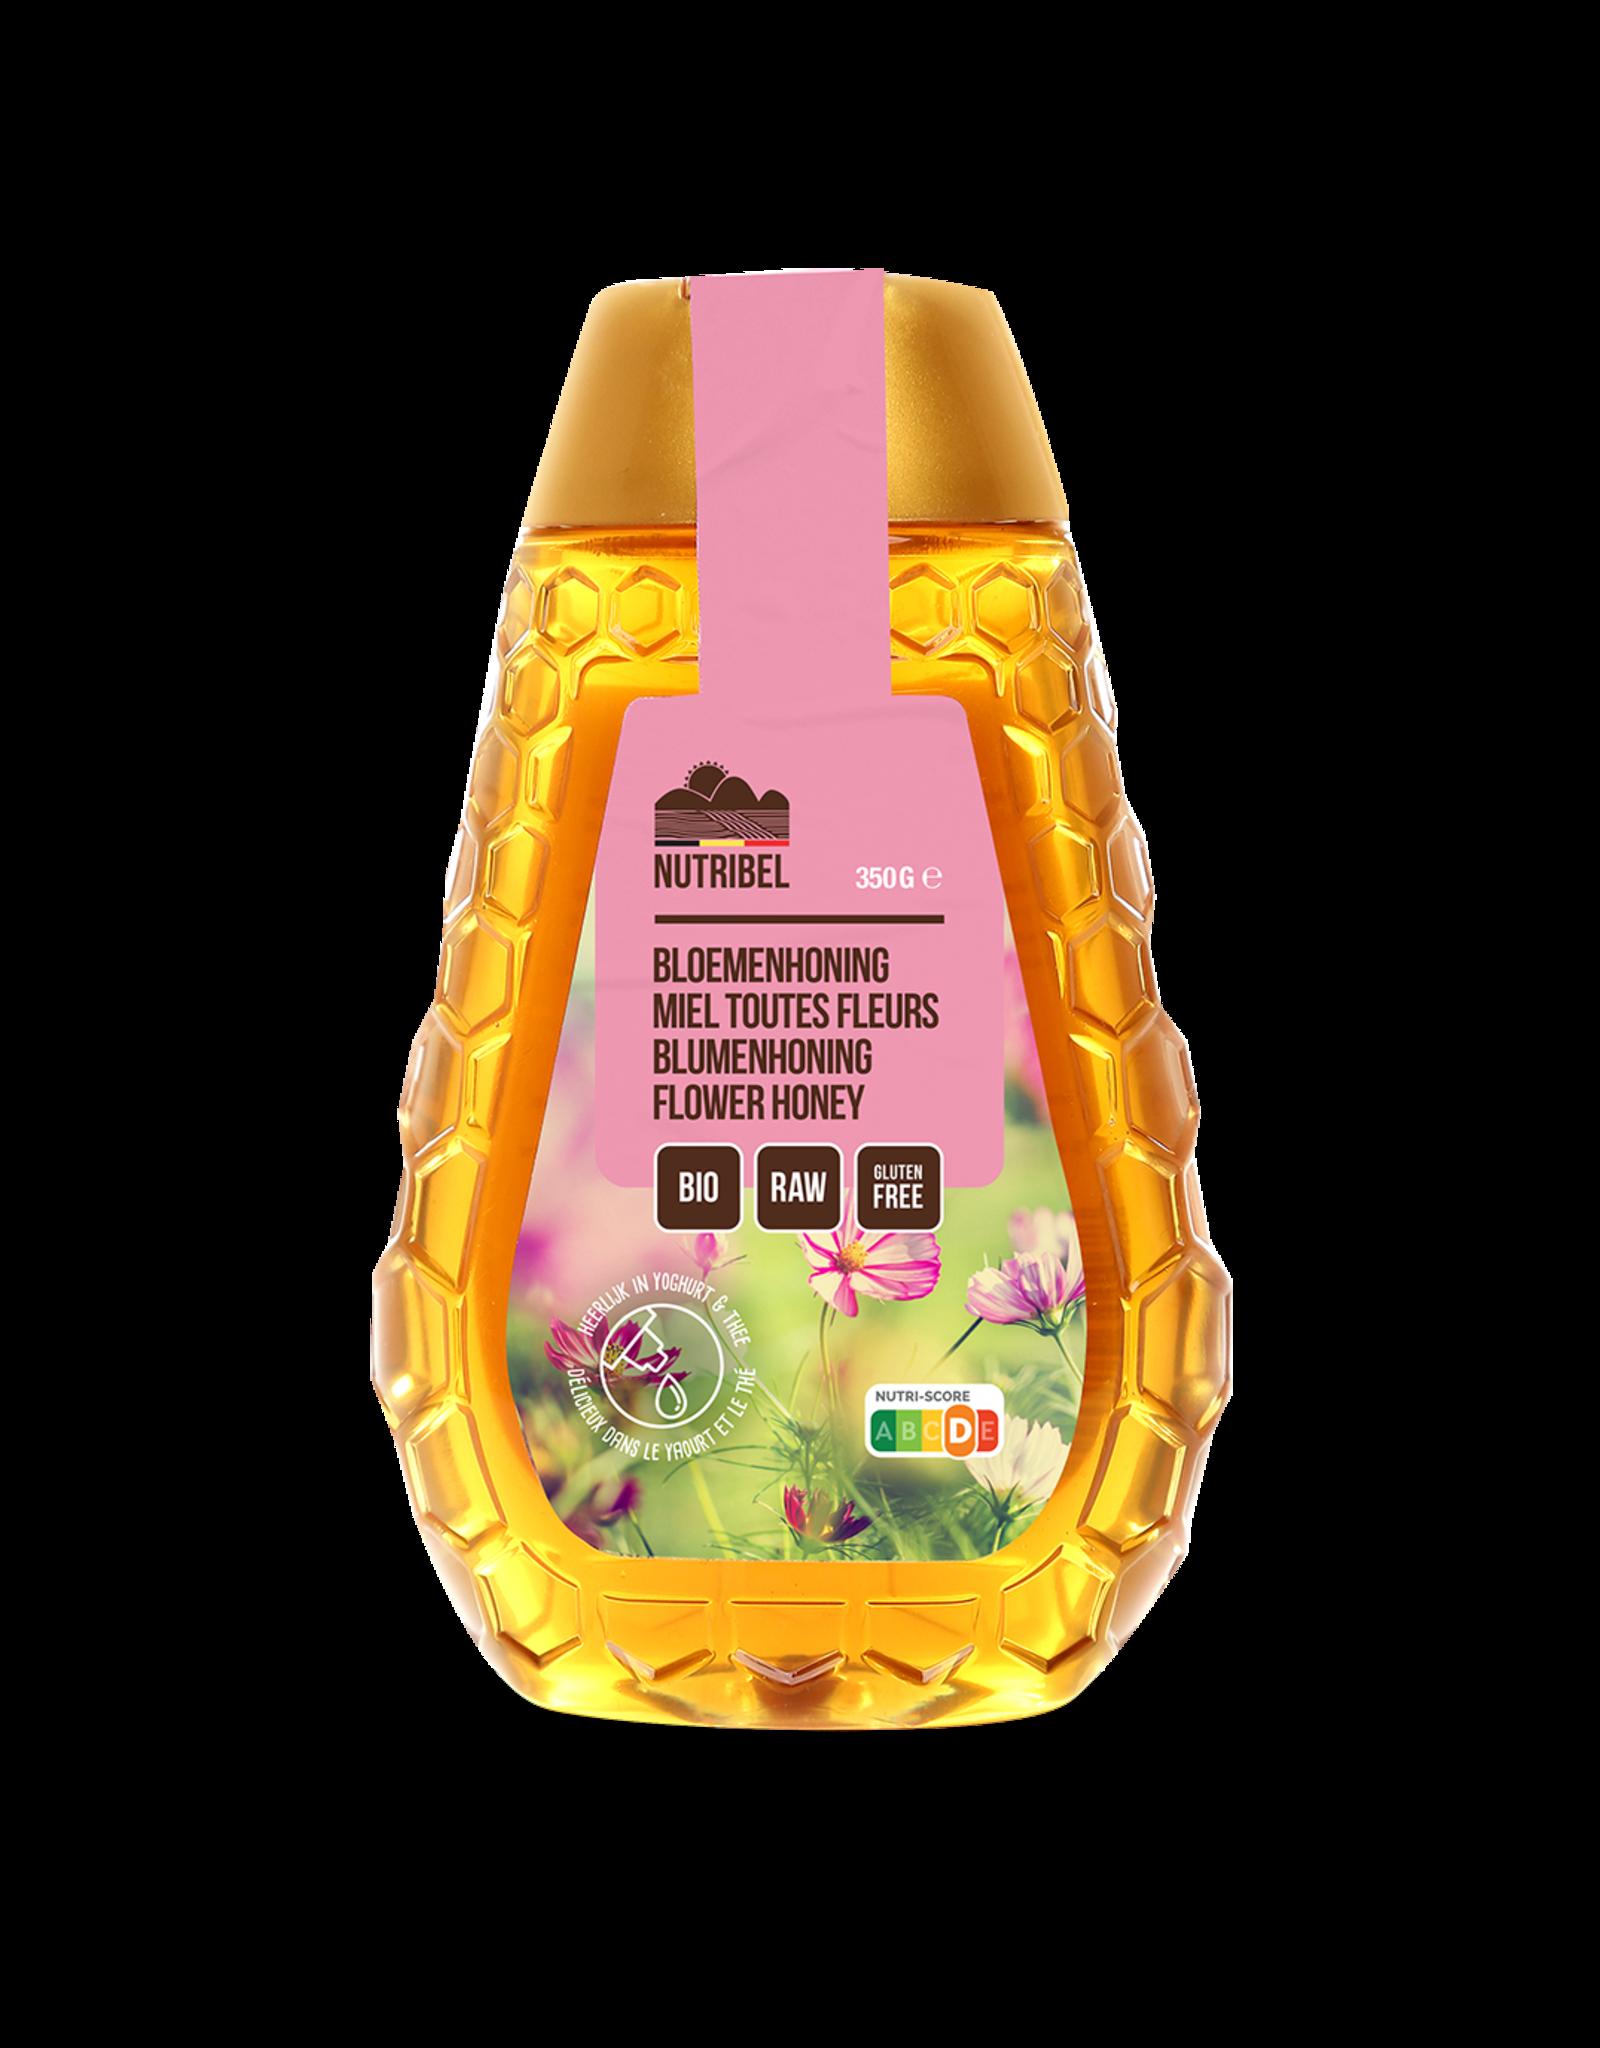 Nutribel Bloemen honing bio 350g